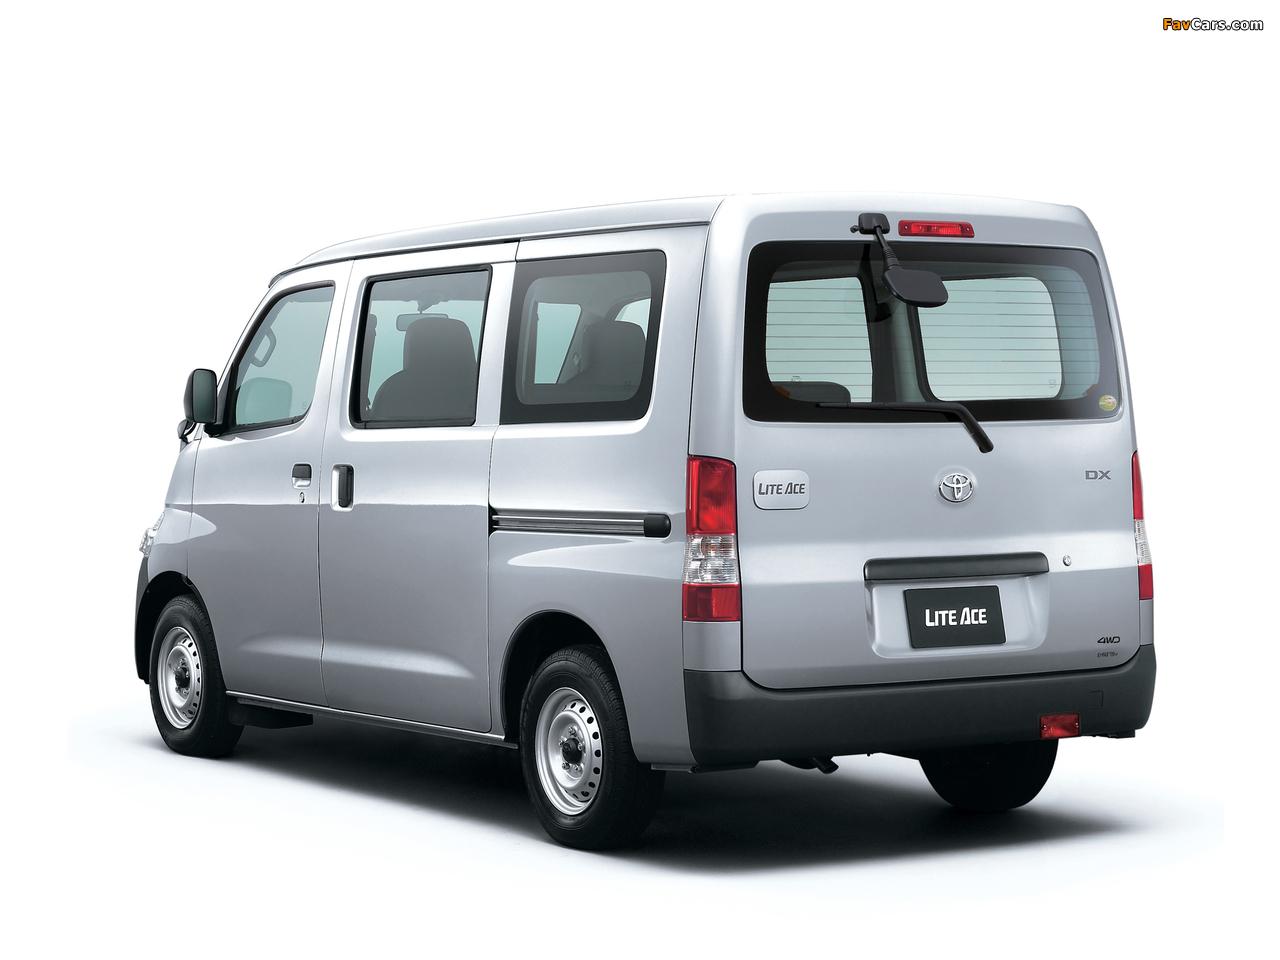 Photos Of Toyota Liteace Van 4wd S402 2010 1280x960